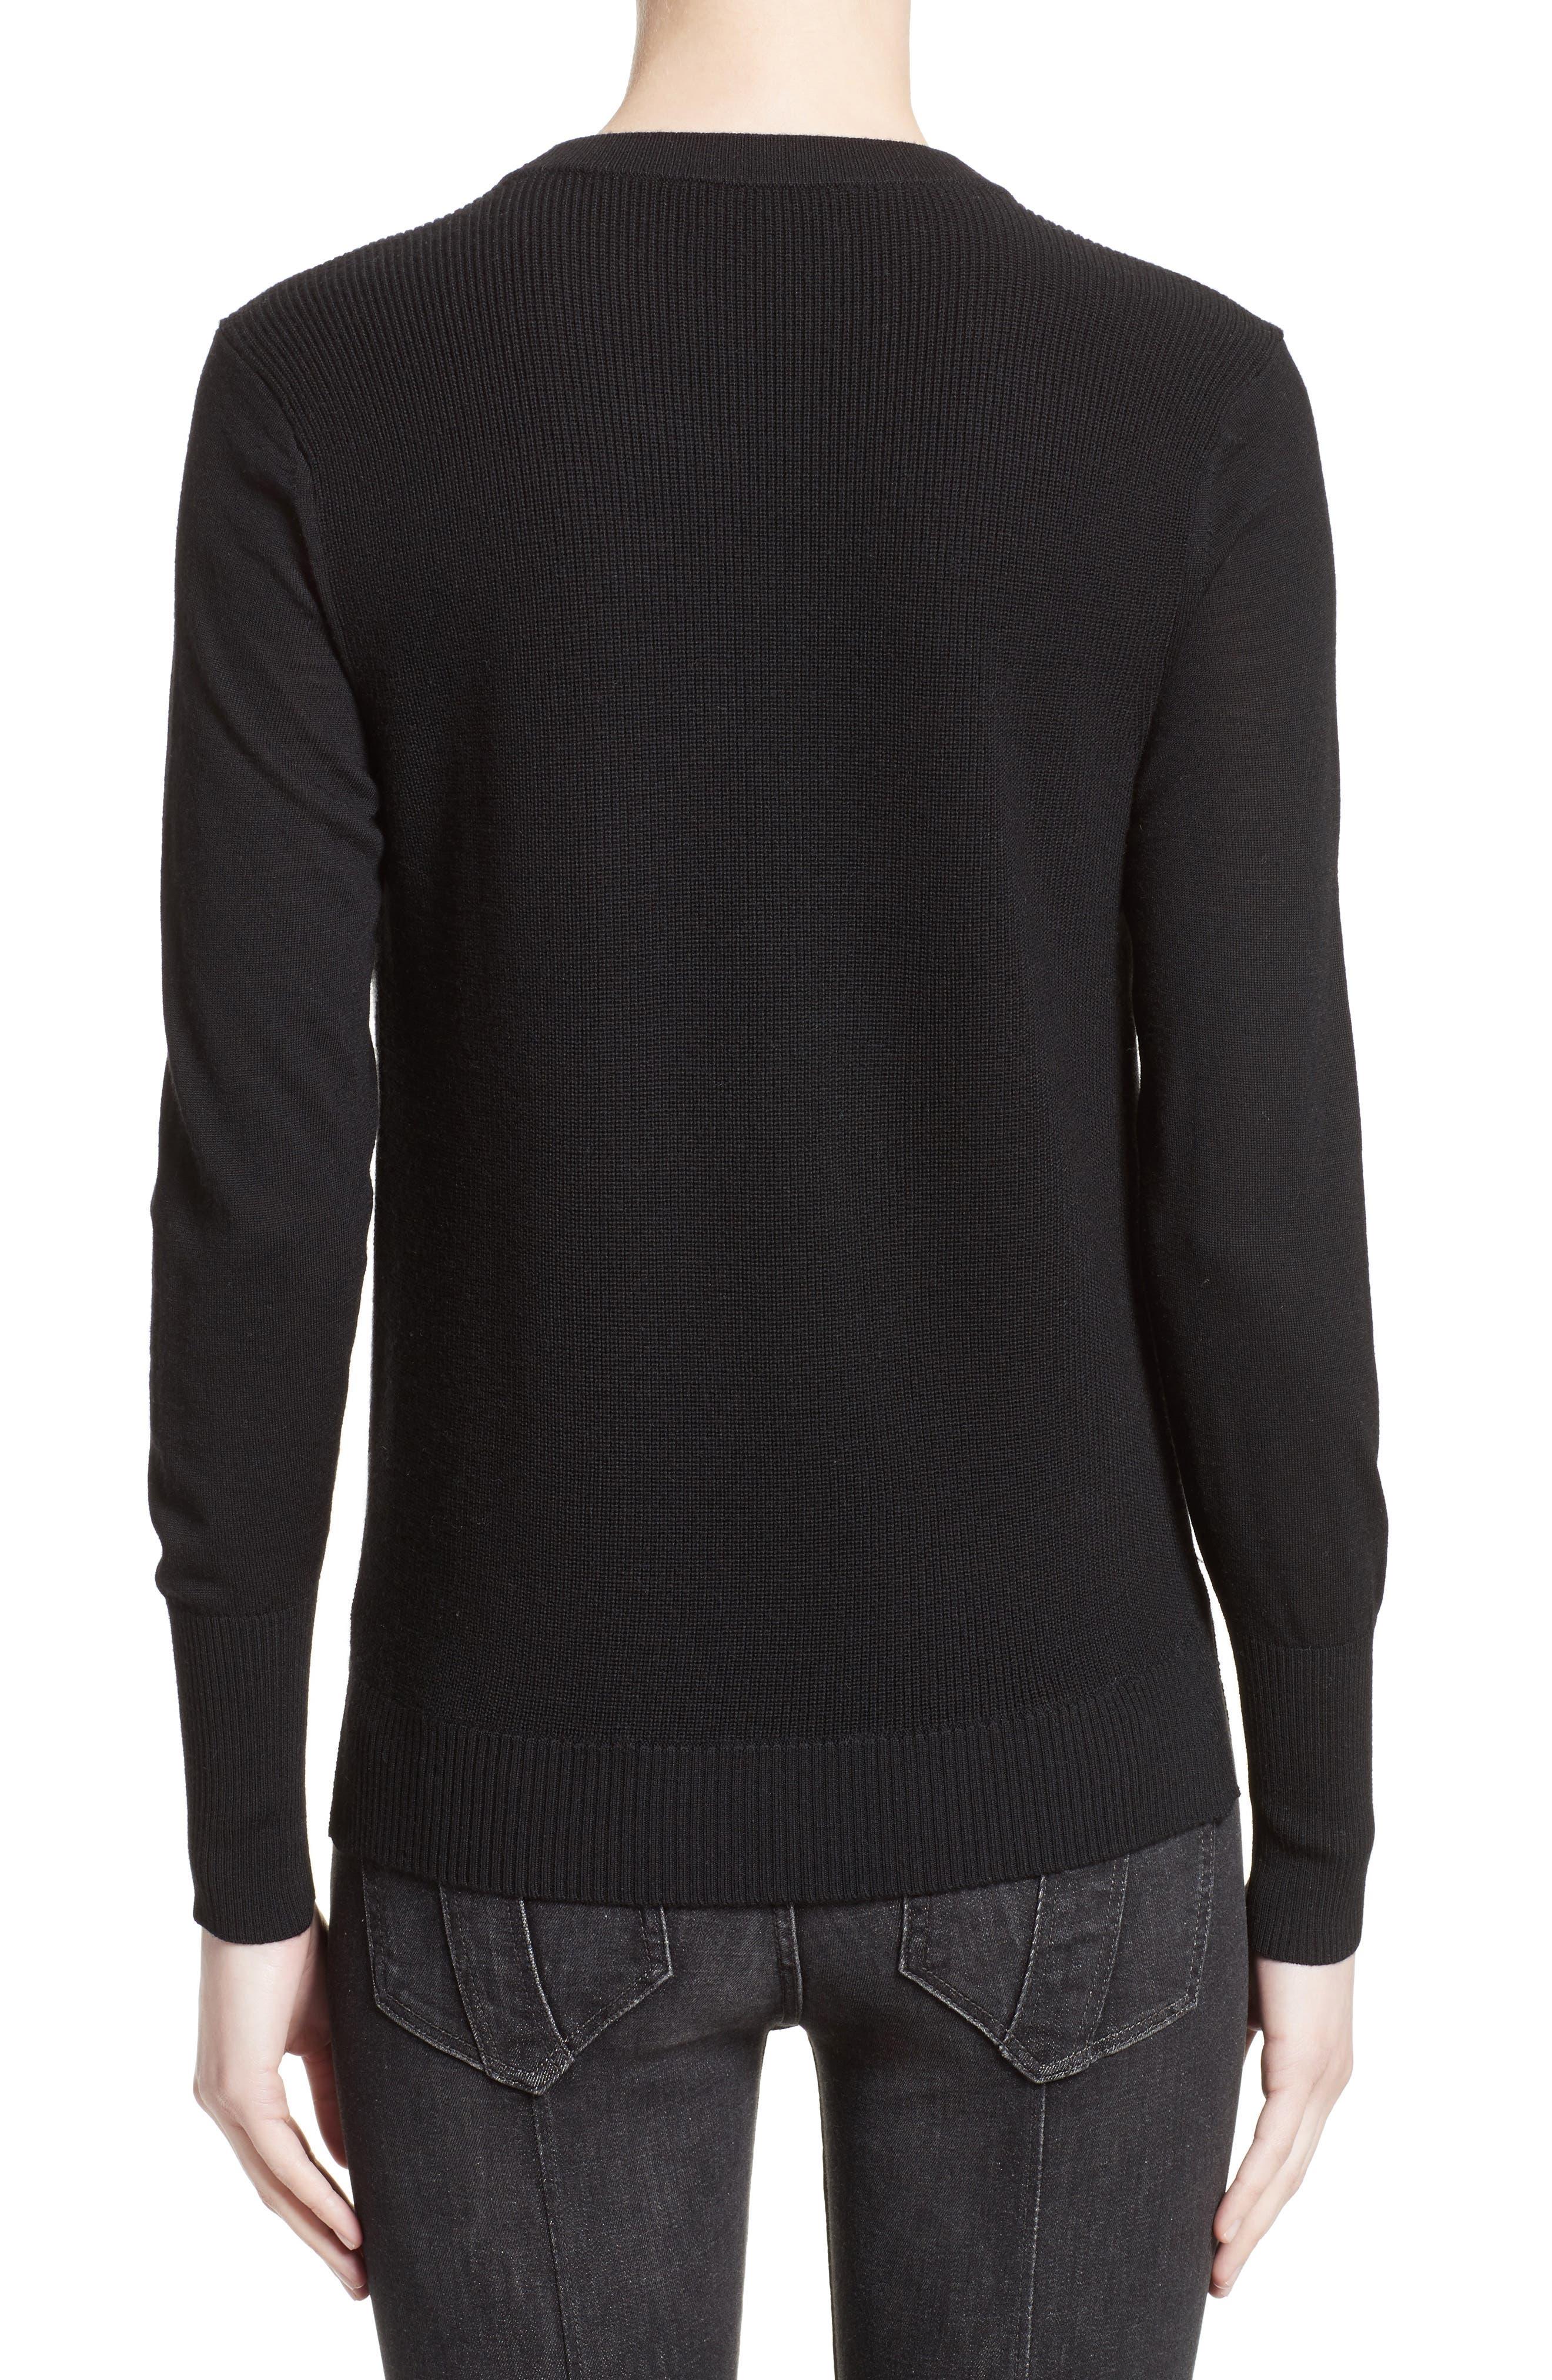 Meigan Merino Wool Sweater,                             Alternate thumbnail 2, color,                             001